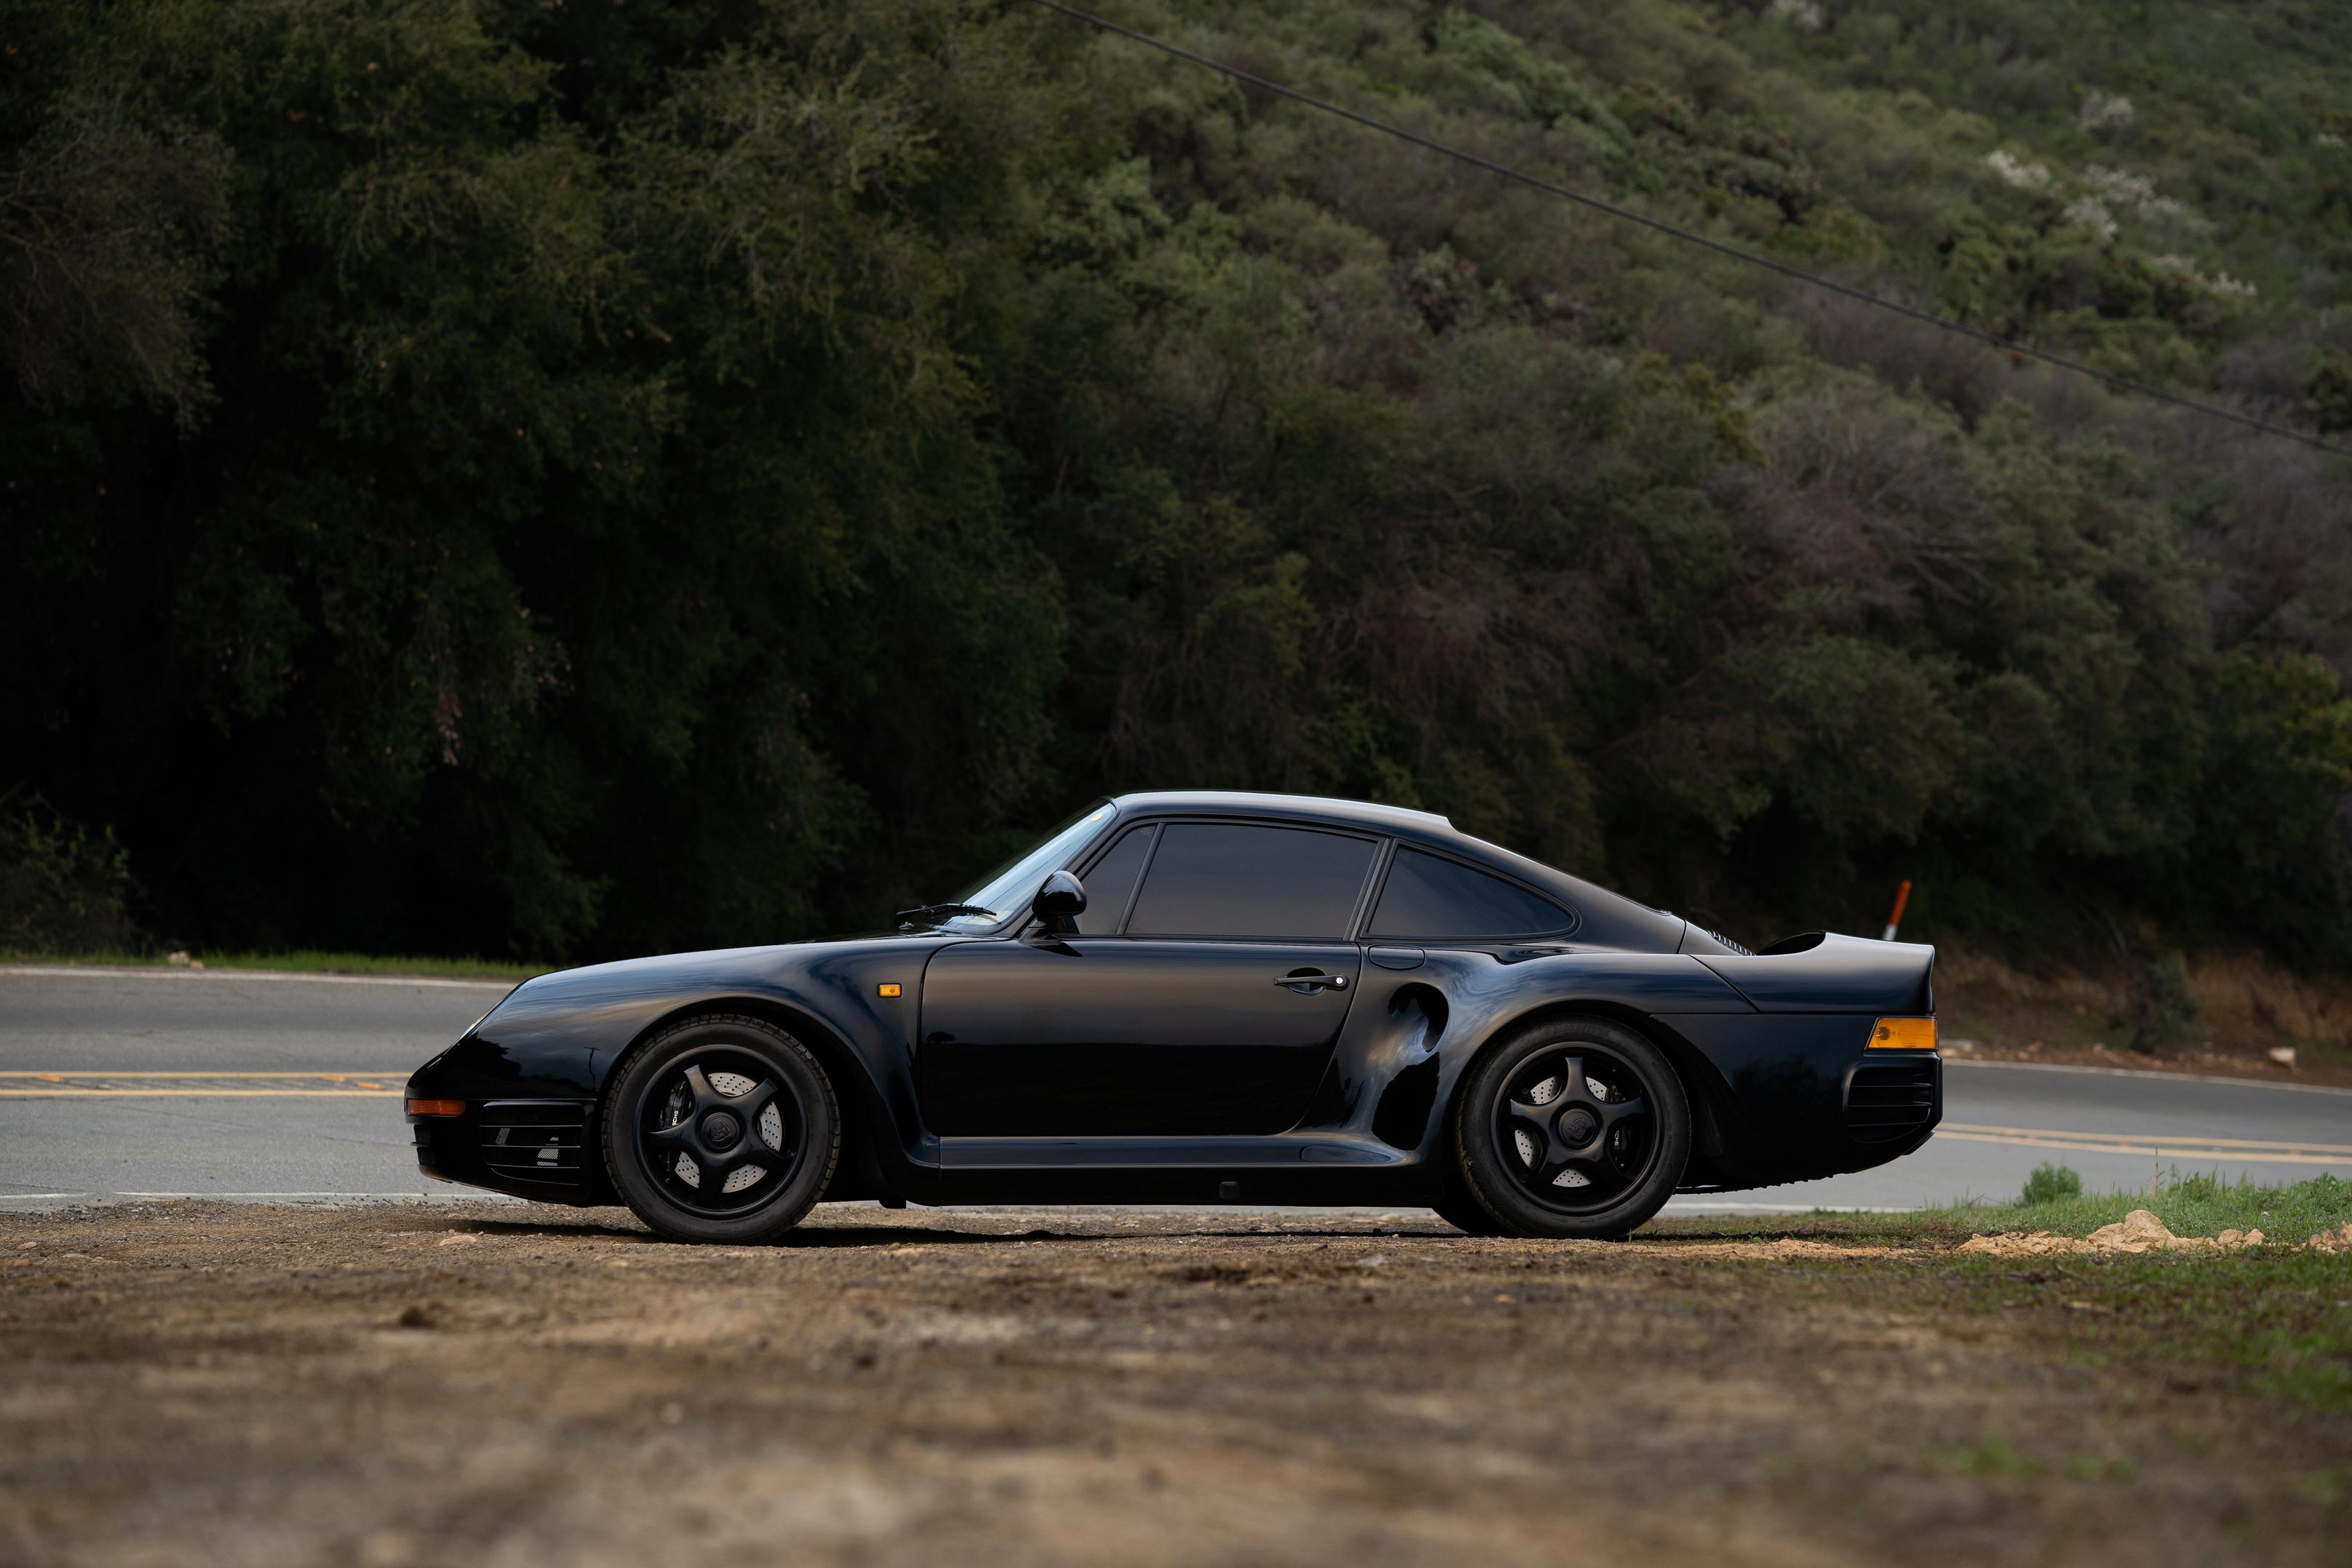 Black Porsche 959